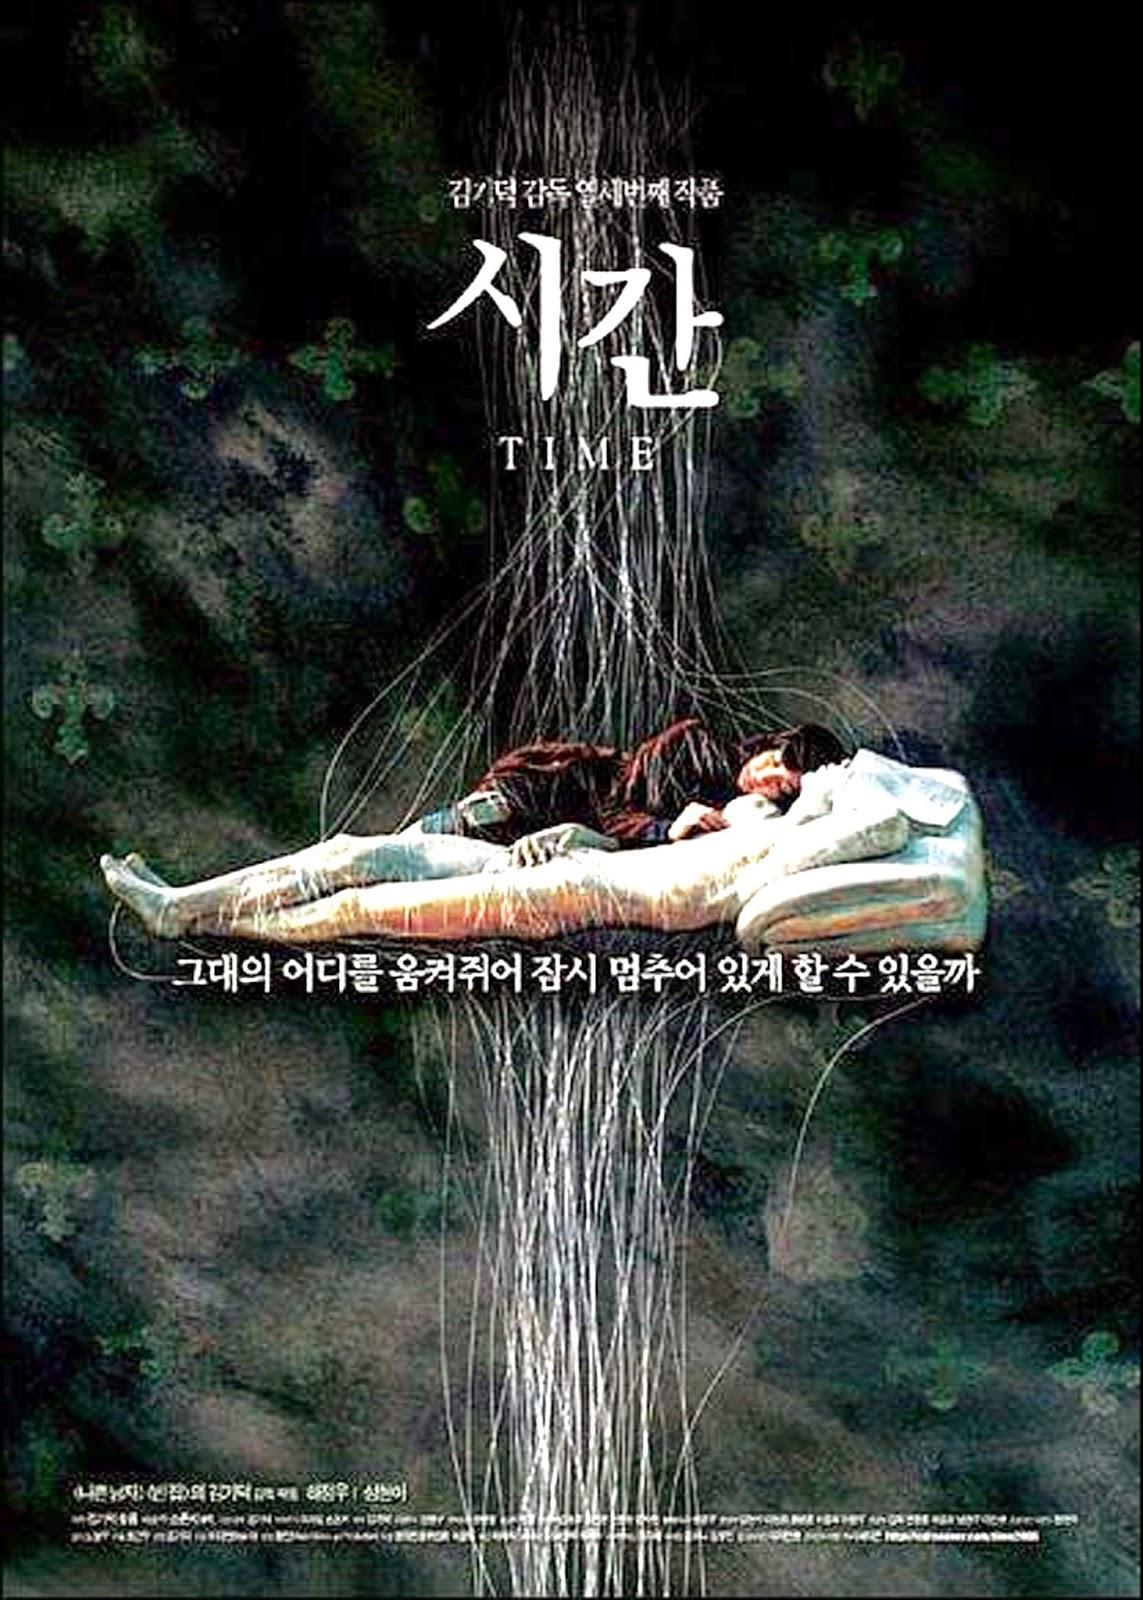 Shi gan (Time) (2006) Drama